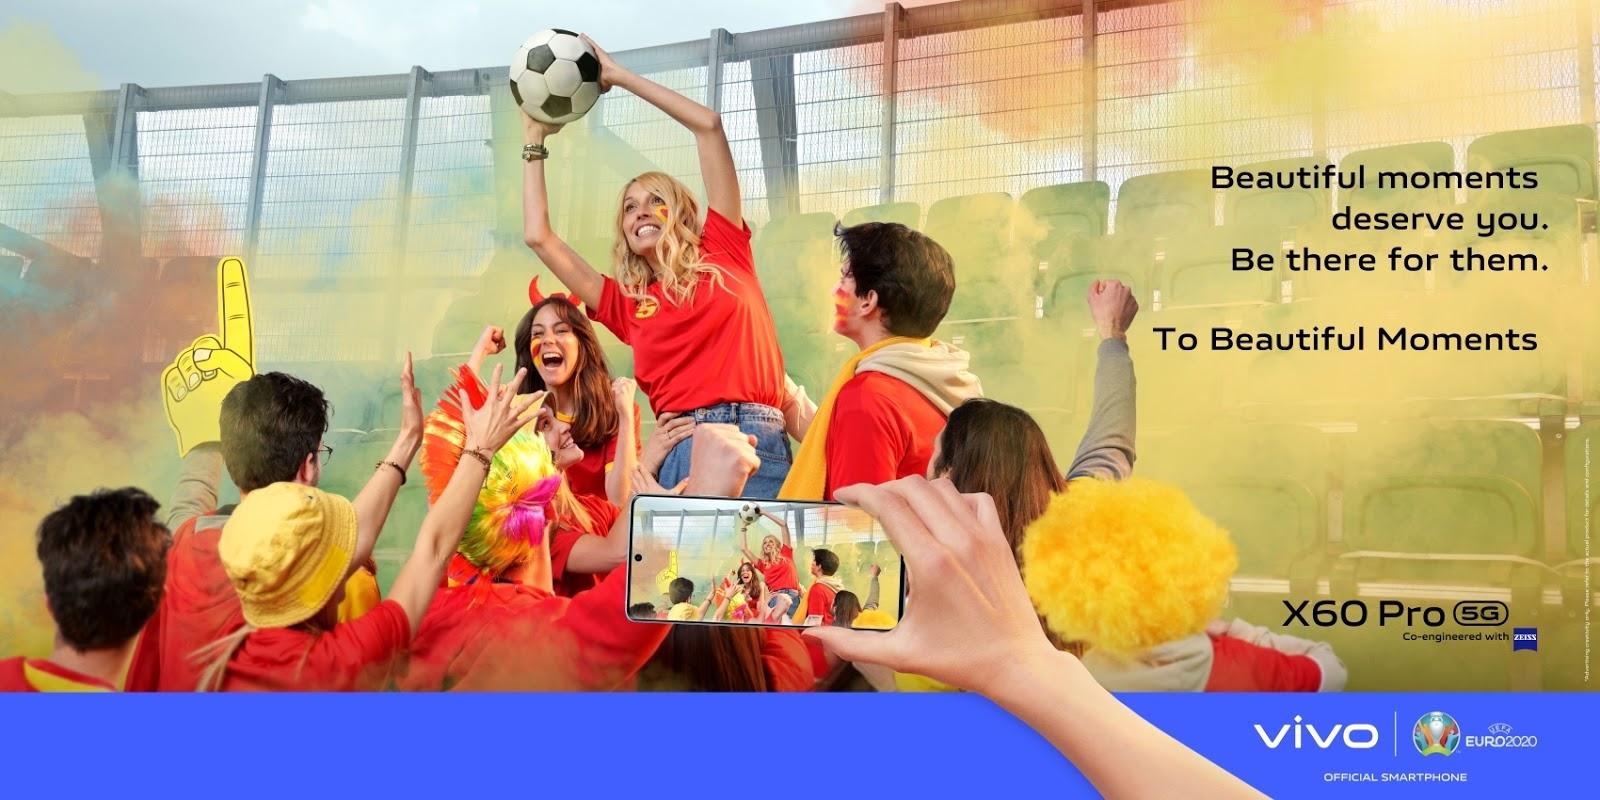 vivo ส่งแคมเปญ To Beautiful Moments ต้อนรับเทศกาลฟุตบอล UEFA EURO 2020 ในฐานะแบรนด์สมาร์ตโฟนผู้สนับสนุนการแข่งขันอย่างเป็นทางการ ตอกย้ำการขยายแบรนด์ในระดับสากลพร้อมเชื่อมต่อกับผู้ใช้งานผ่านกีฬาที่ได้รับความนิยมจากผู้คนทั่วโลกมากที่สุด